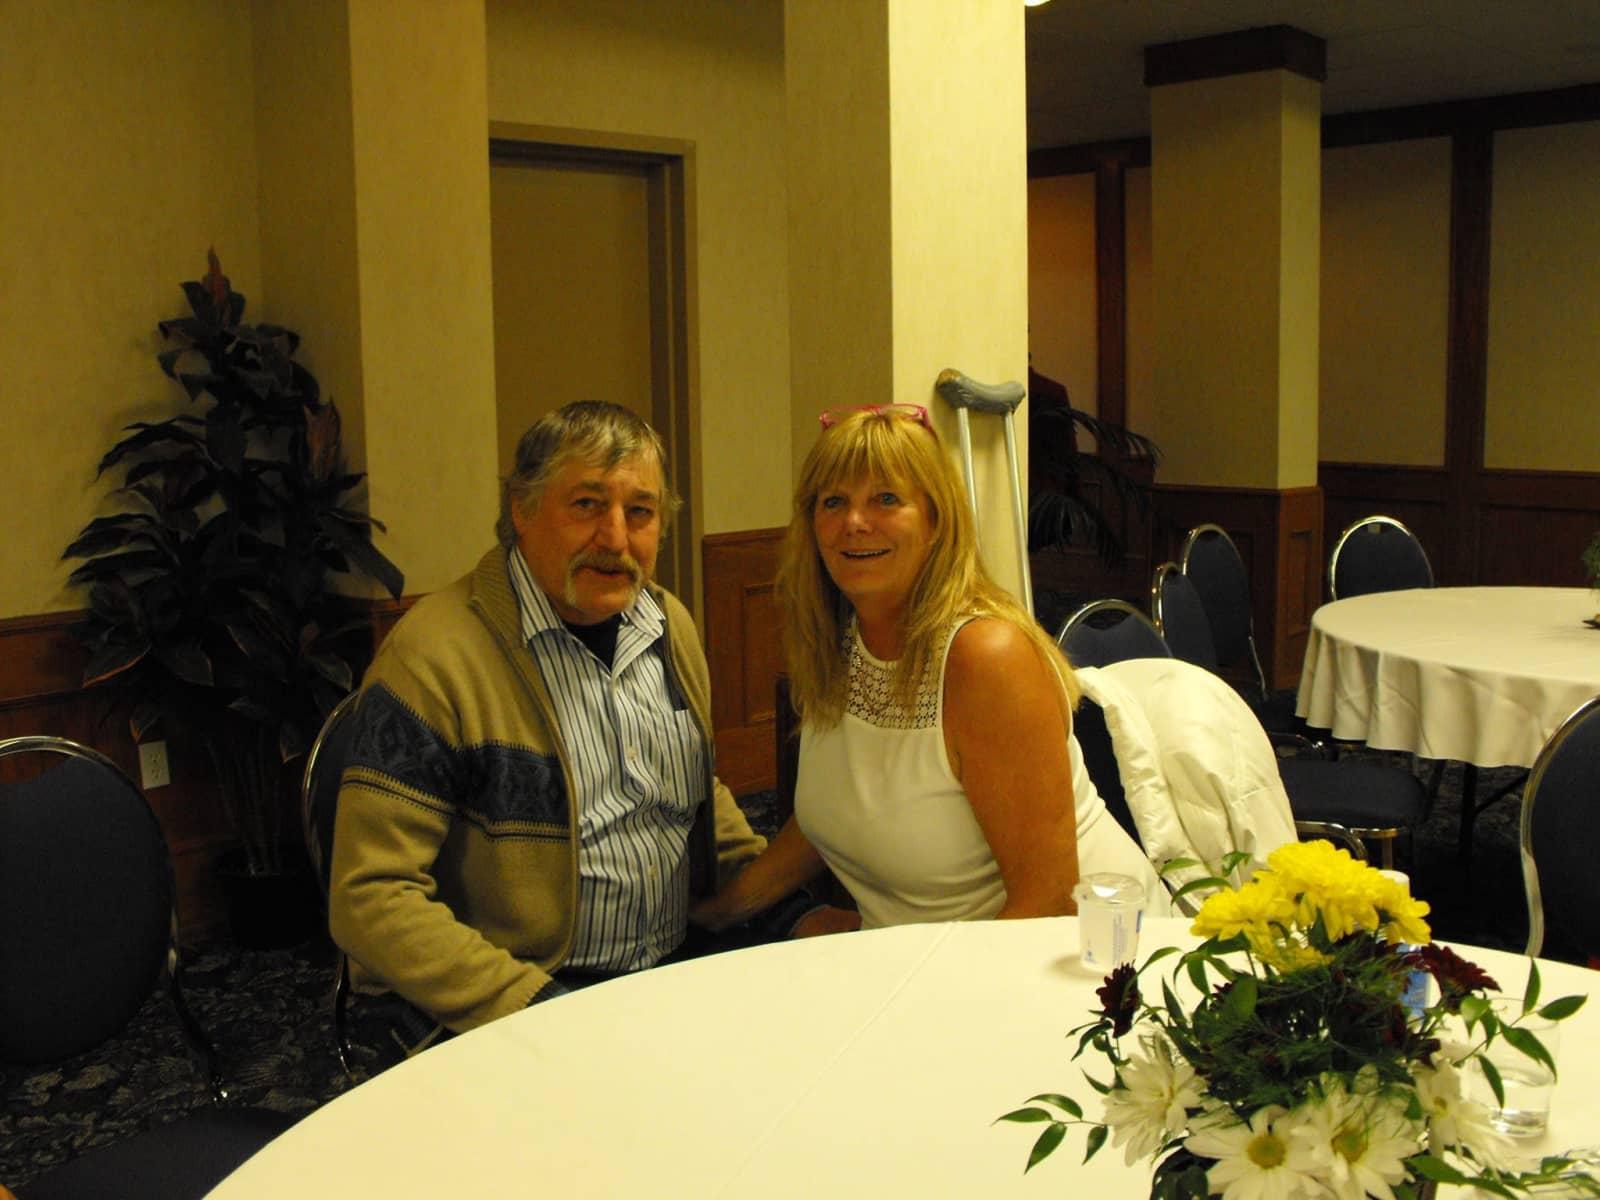 Darlene & Brian from Nakusp, British Columbia, Canada